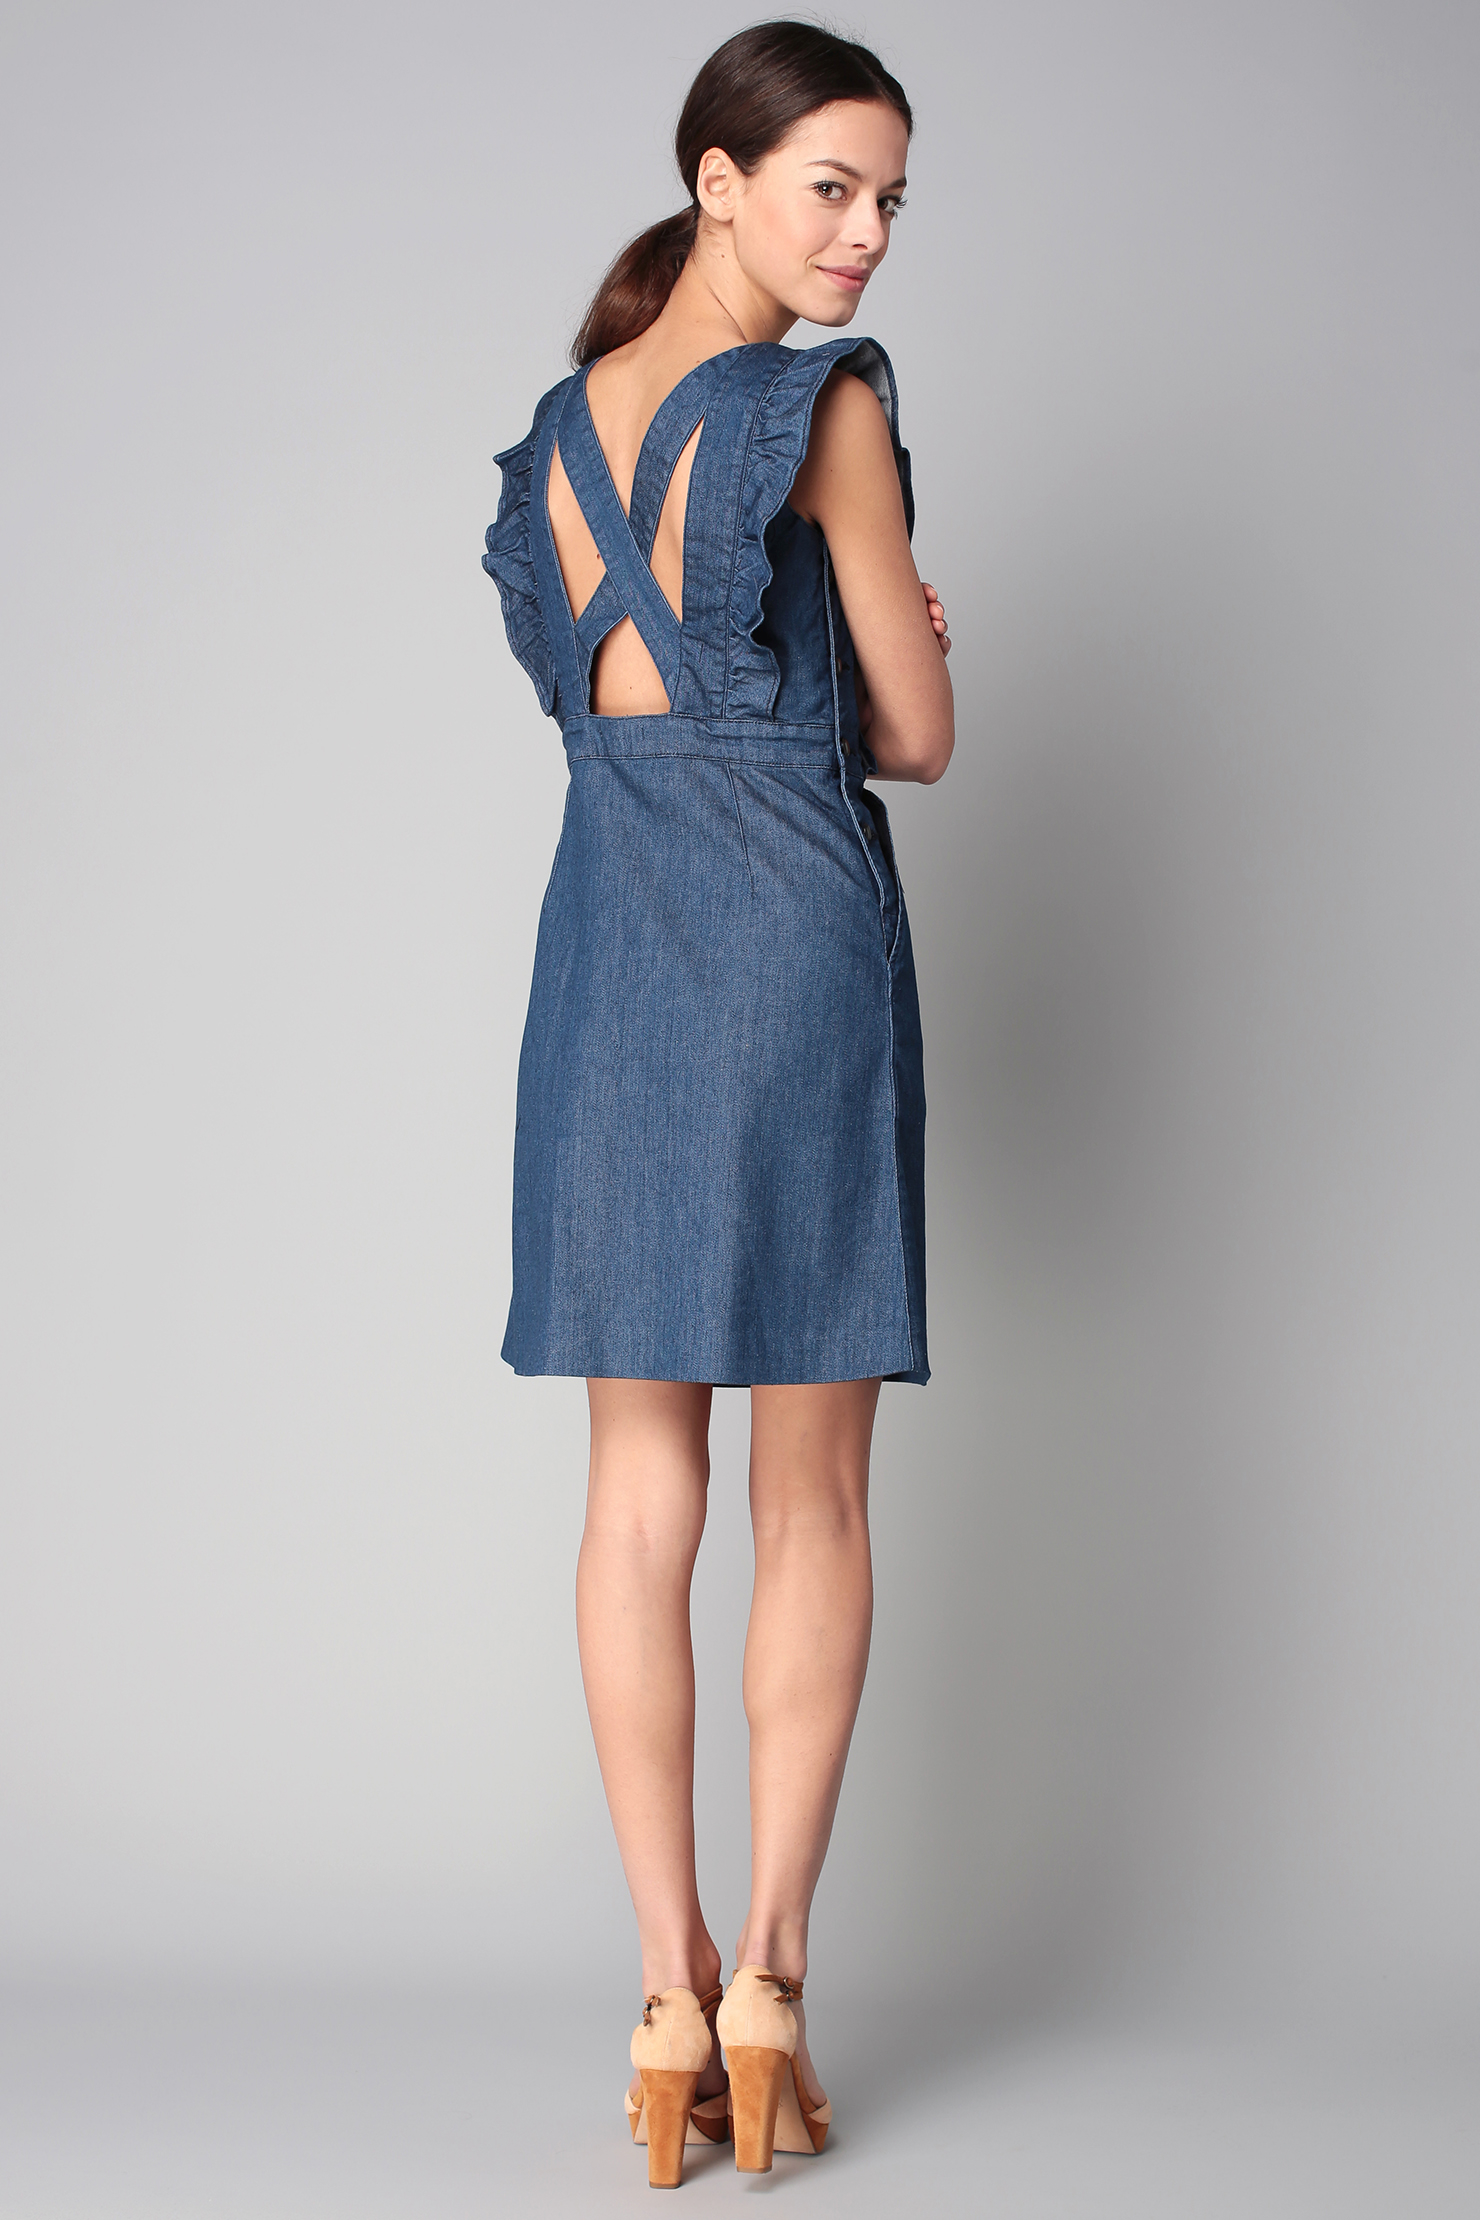 Cacharel Short/knee Length Dress in Blue